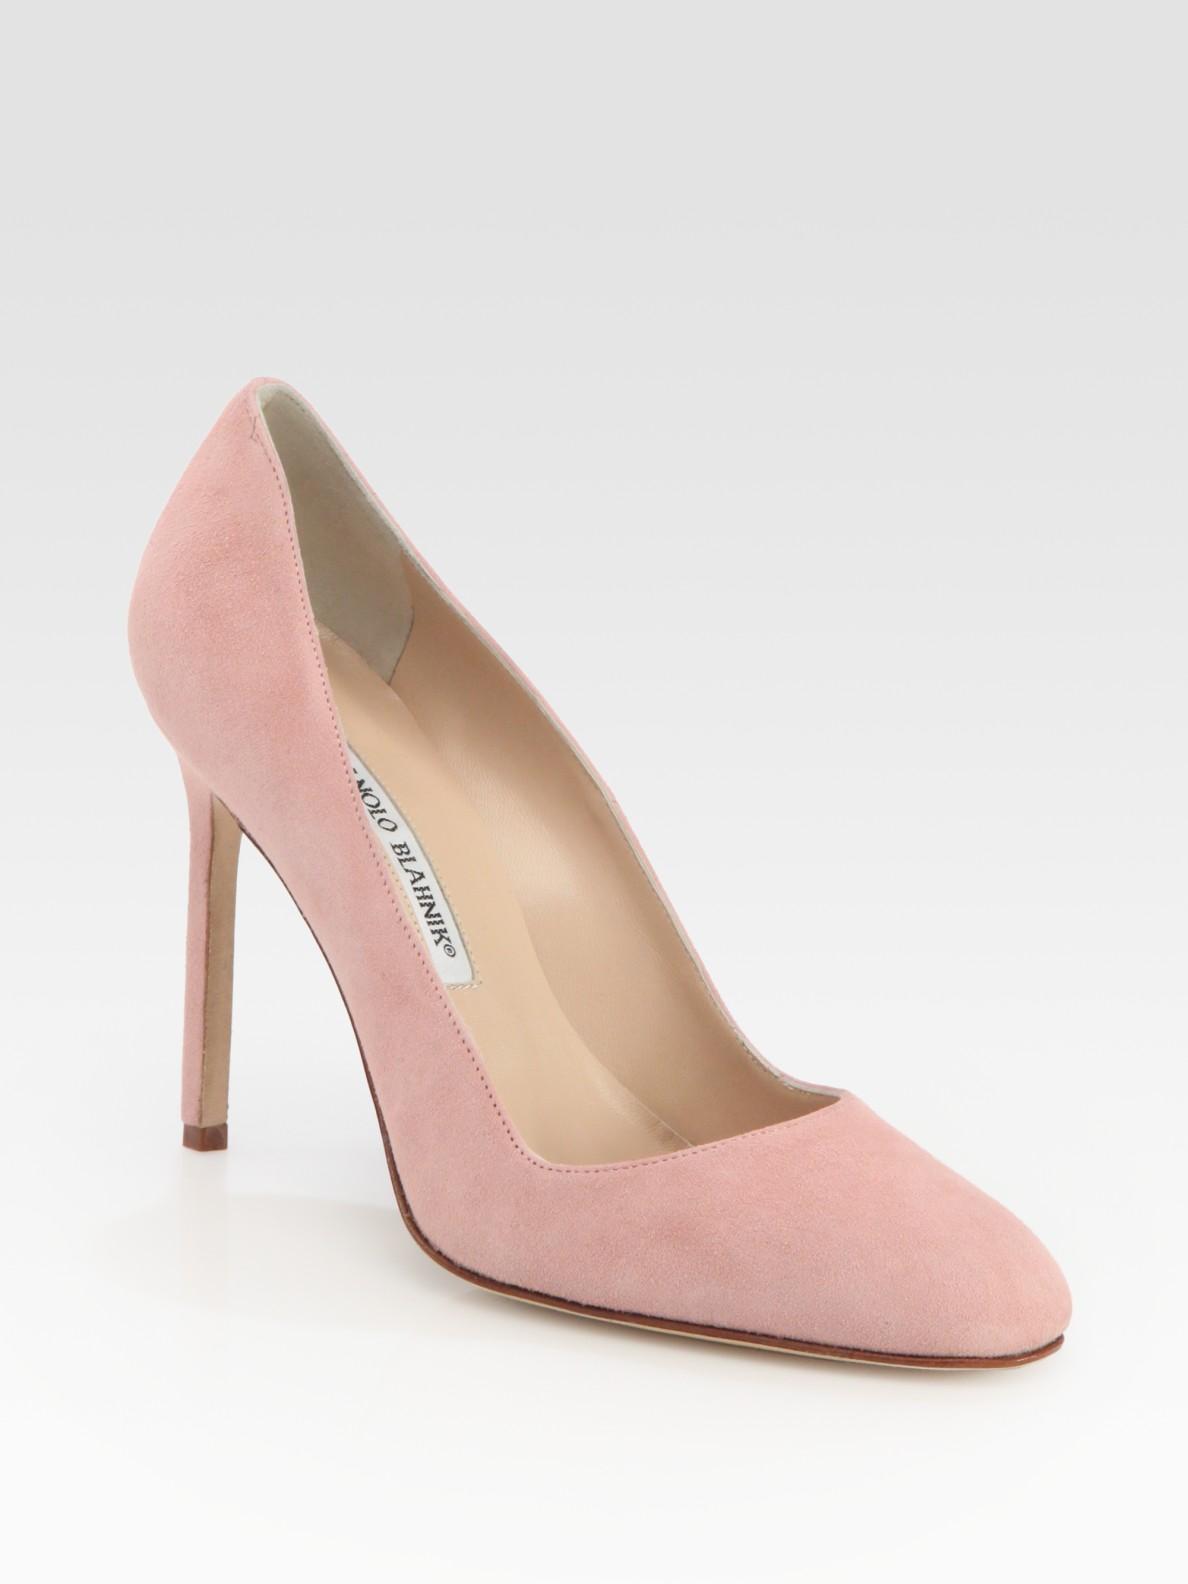 6949b96b58b8 Lyst - Manolo Blahnik Bb Suede Round Toe Pumps in Pink